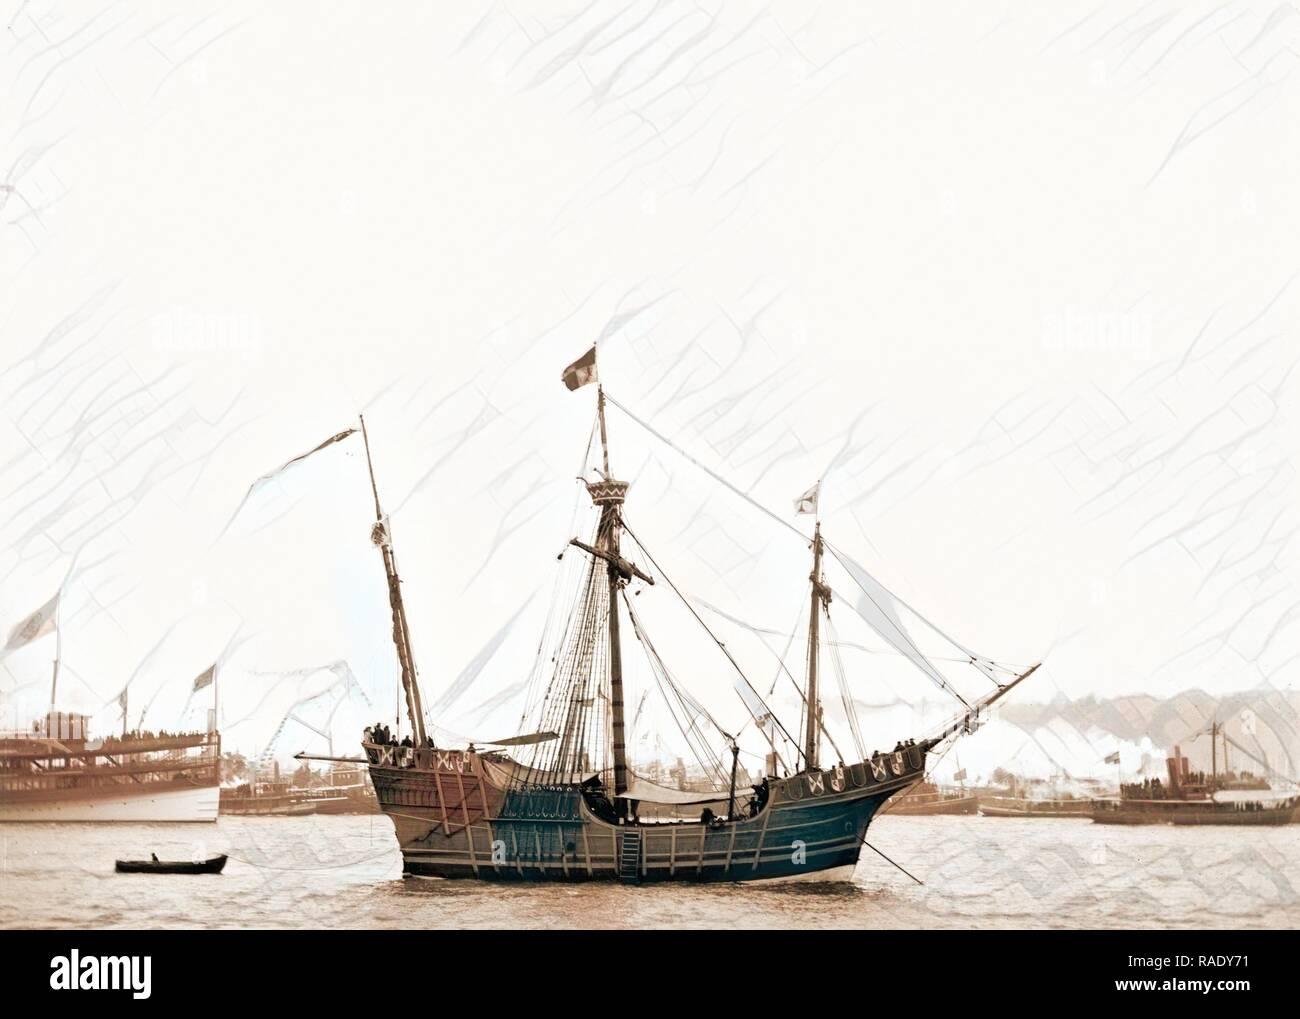 Spanish caravel Santa Maria, Santa Maria (Sailing ship : Replica), Ships, 189. Reimagined by Gibon. Classic art with reimagined - Stock Image